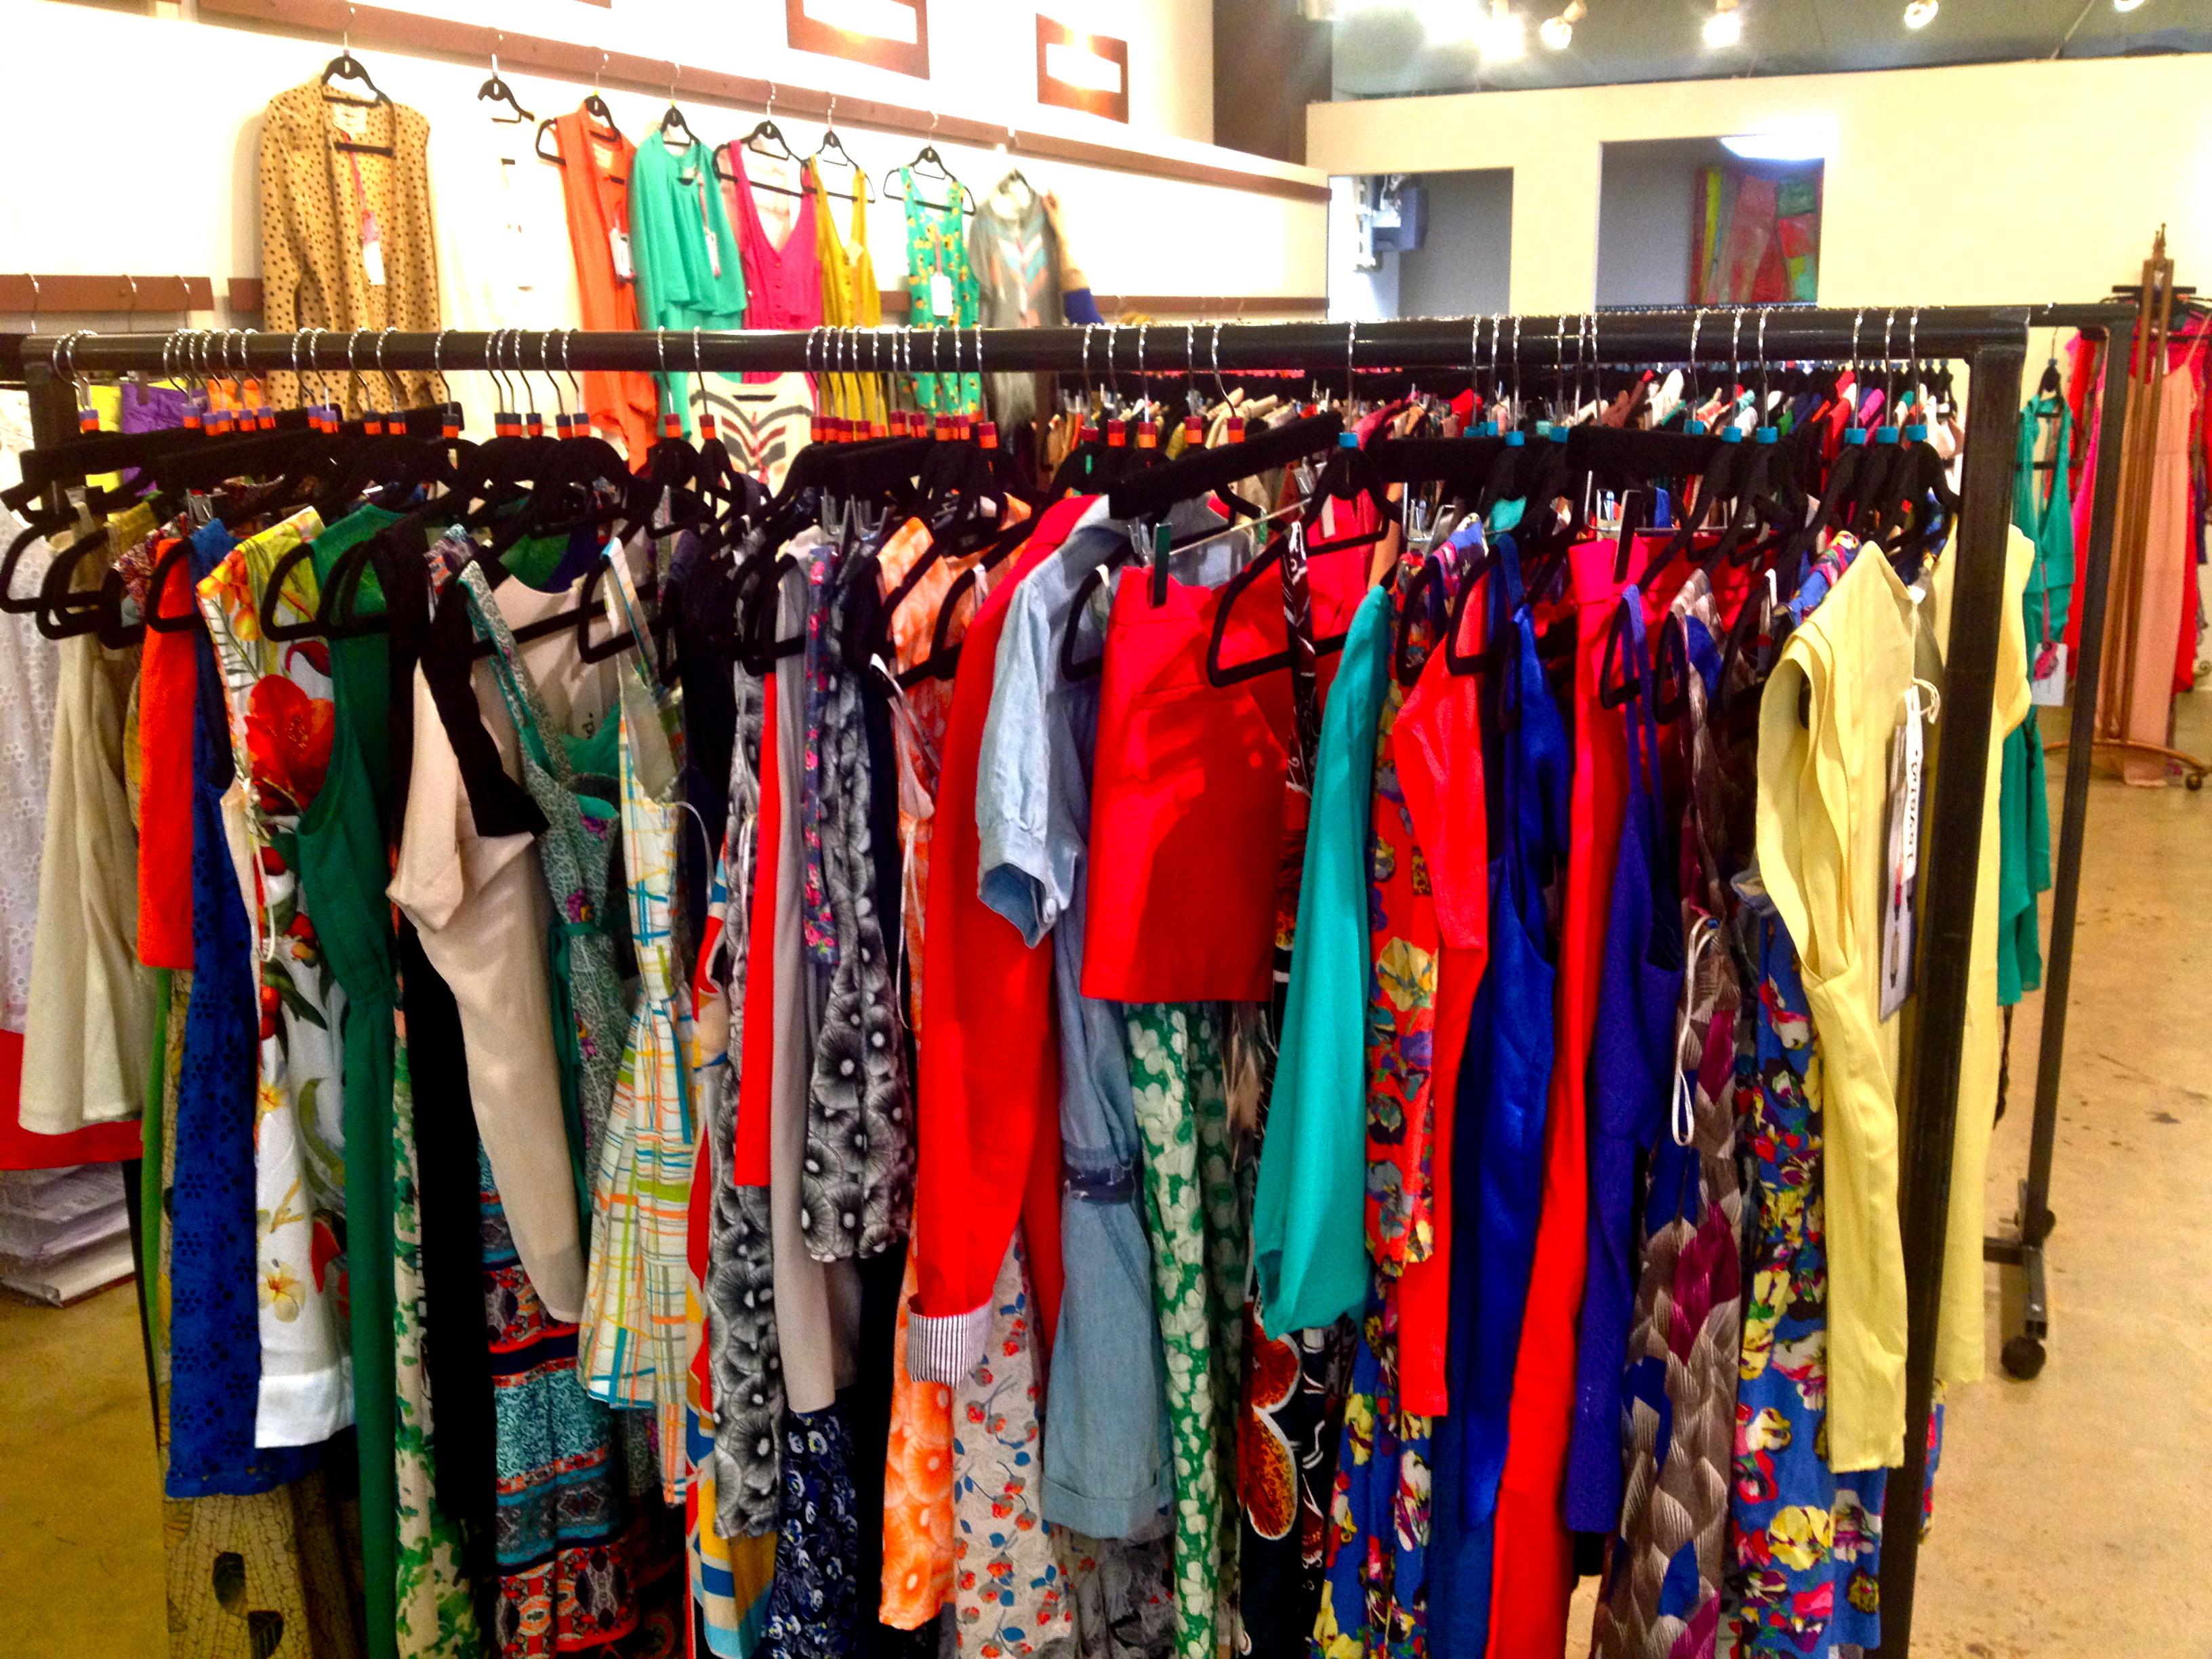 Colorado clothing stores